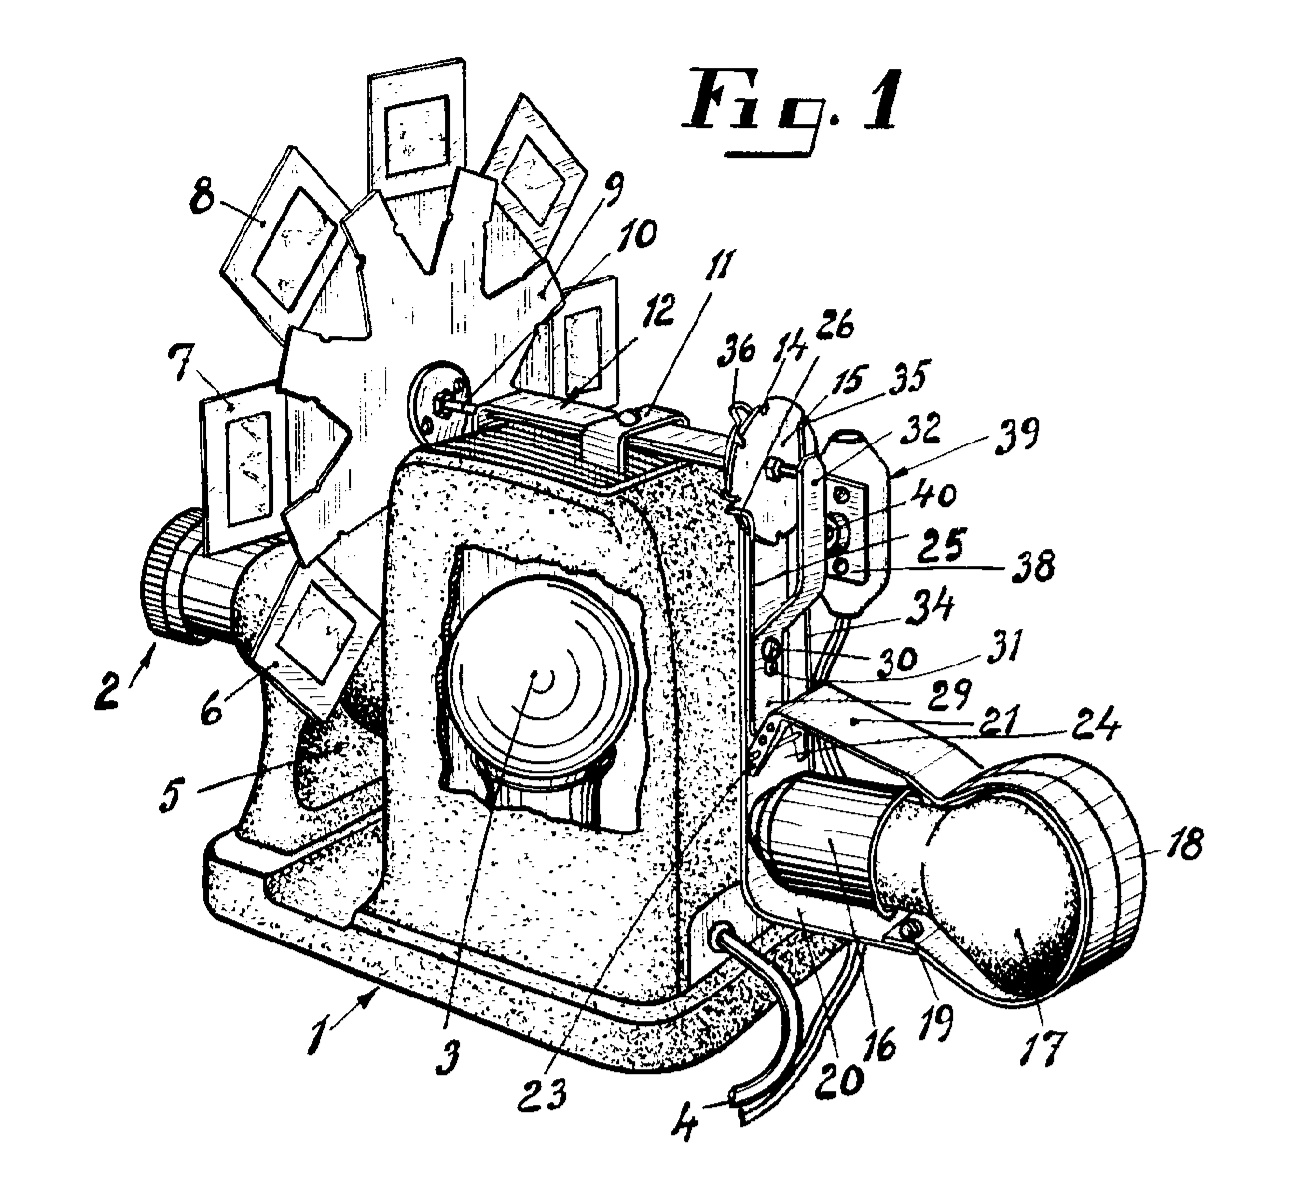 Figure 1 from Swedish patent 188863, Anordning för åstadkommande av stegvis matningsrörelse. Device to accomplish a stepwise feeding movement., G. E. W. Svensson, Halmstad [Public domain], via Wikimedia Commons